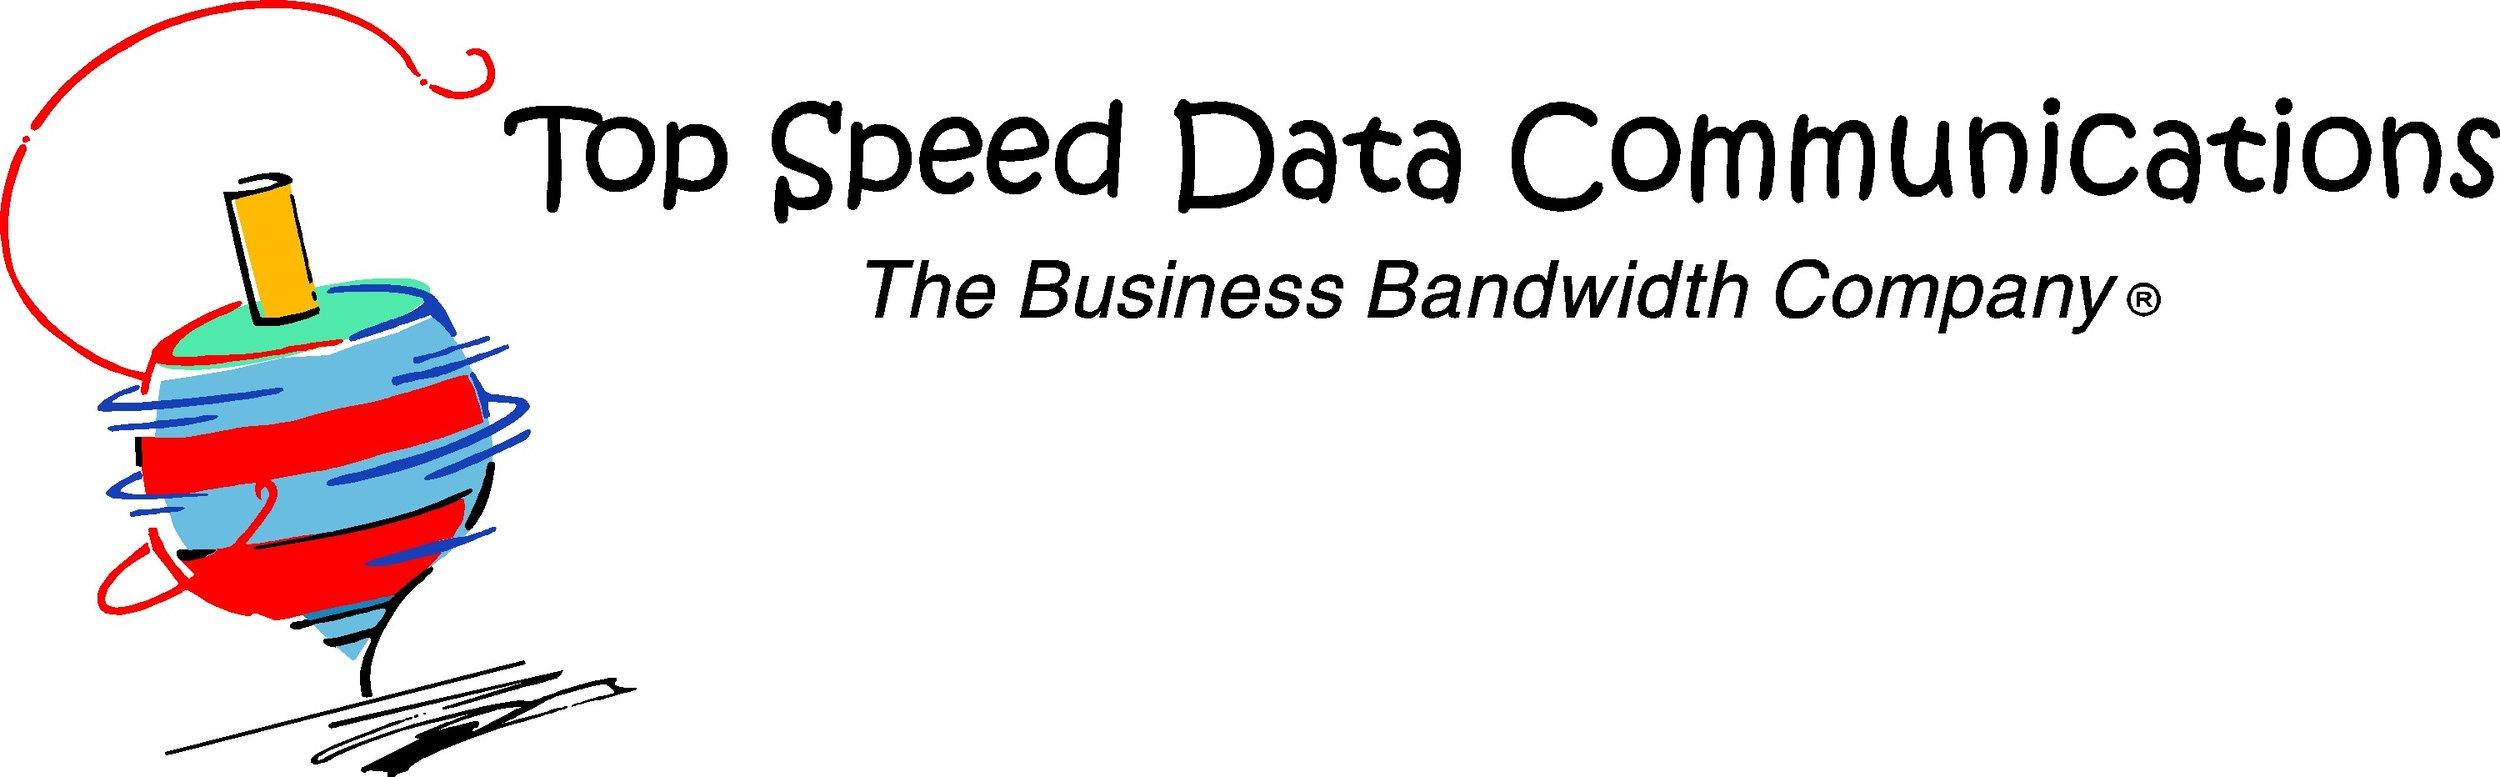 Top Speed Data Comm.jpg